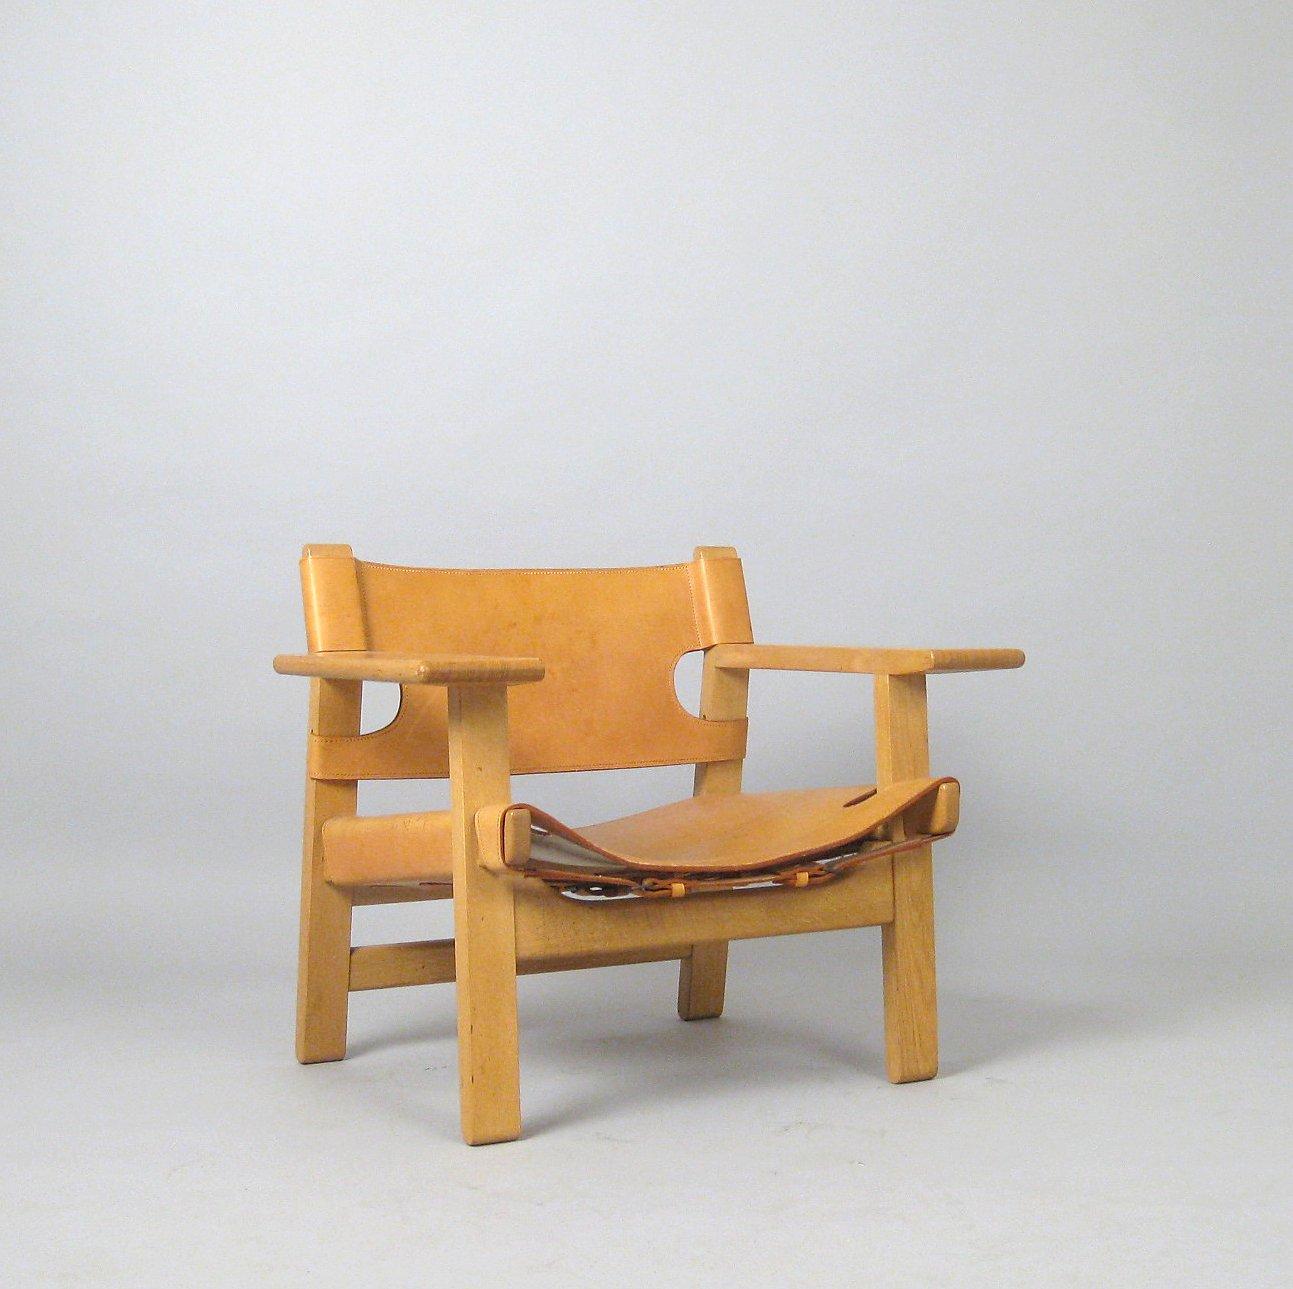 lounge stuhl hee lounge stuhl hay design lounge stuhl loungestuhl unico cognac metall. Black Bedroom Furniture Sets. Home Design Ideas